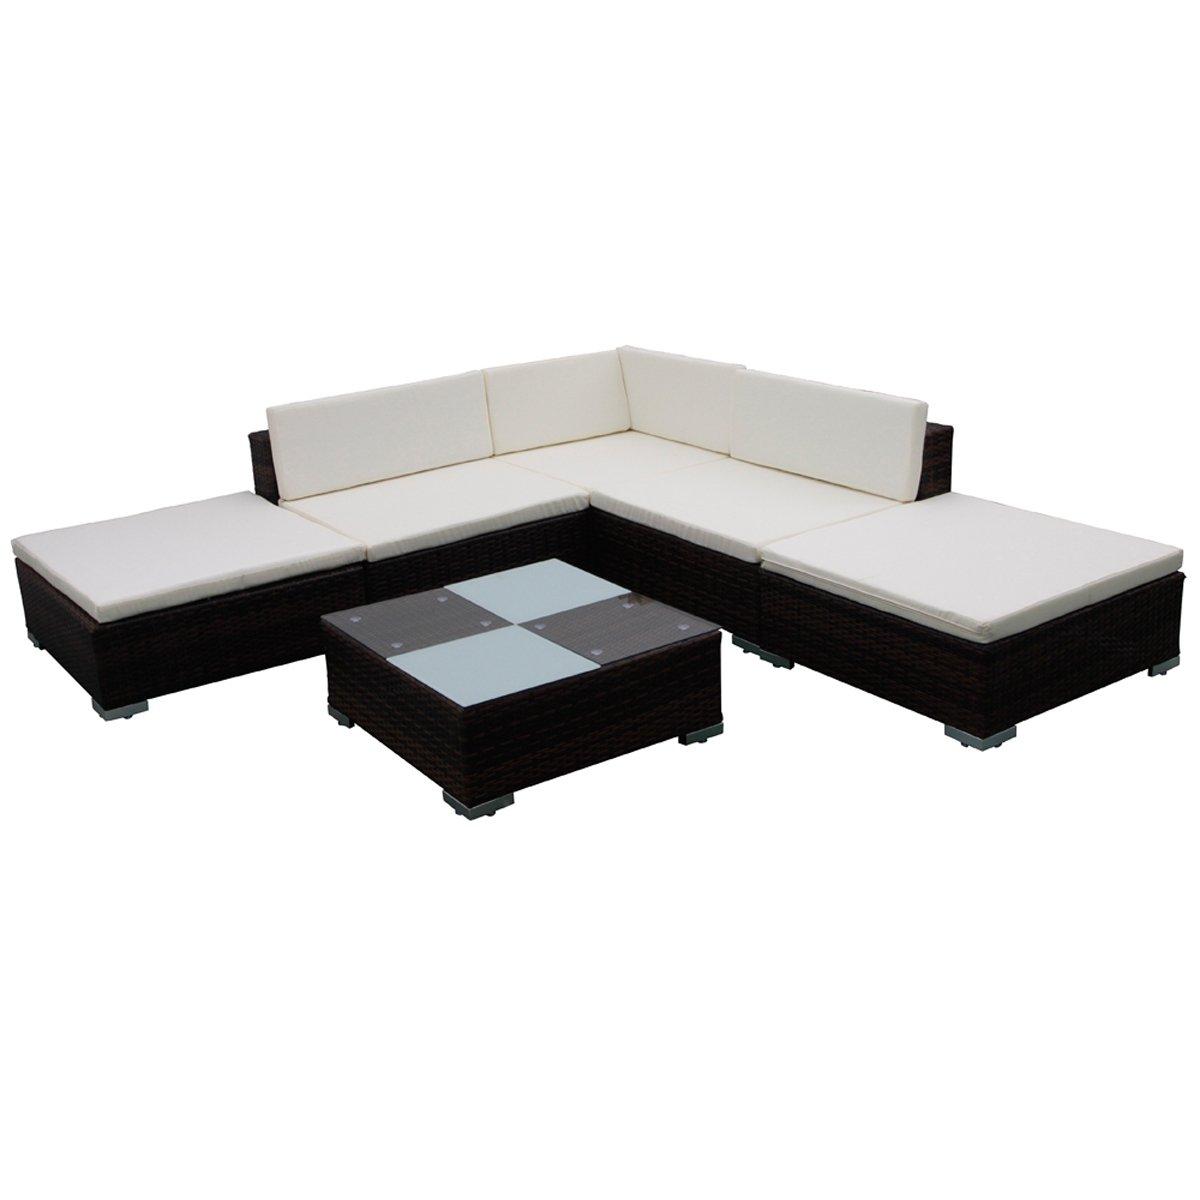 Gartenmöbel Poly Rattan Set Lounge Braun 15-teilig